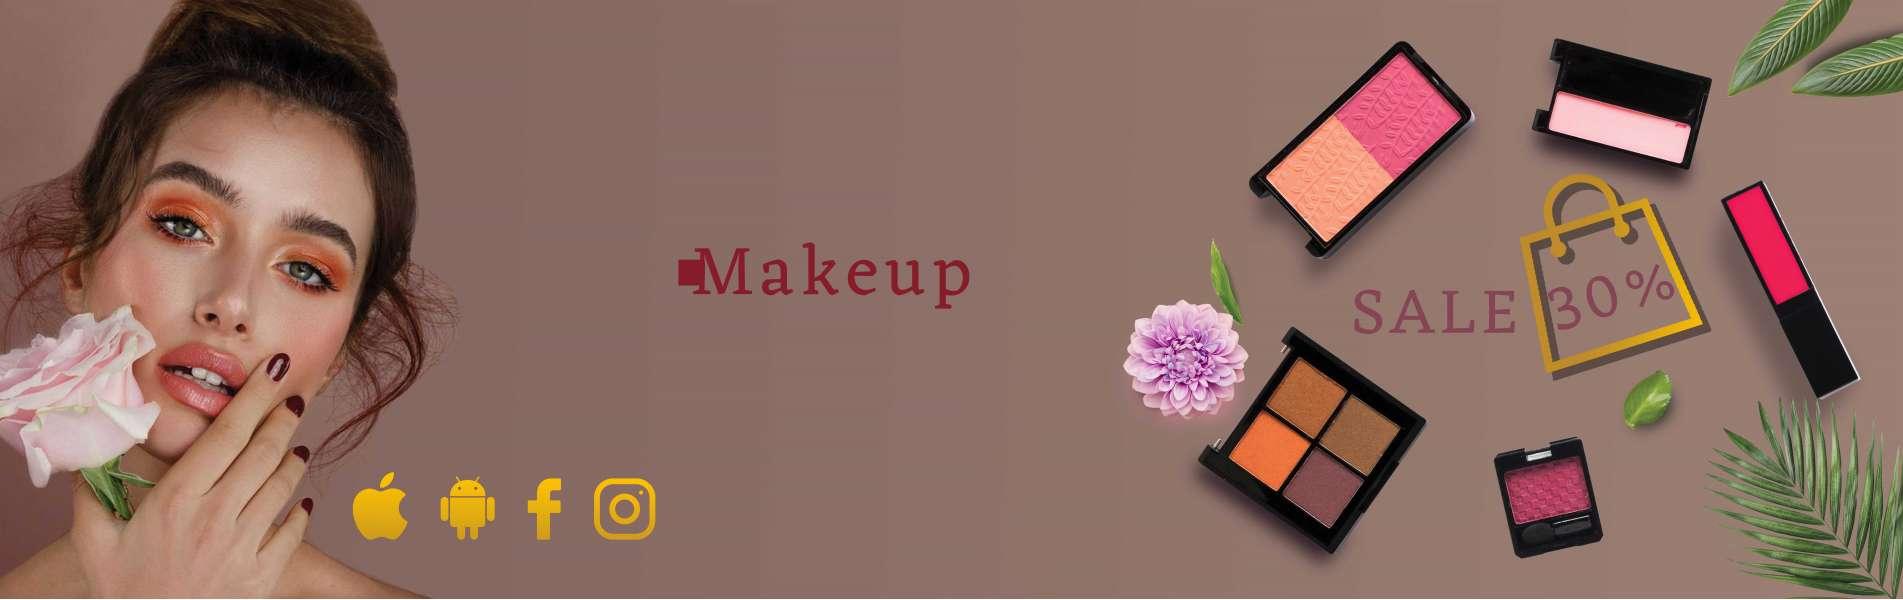 Perfumes&Beauty